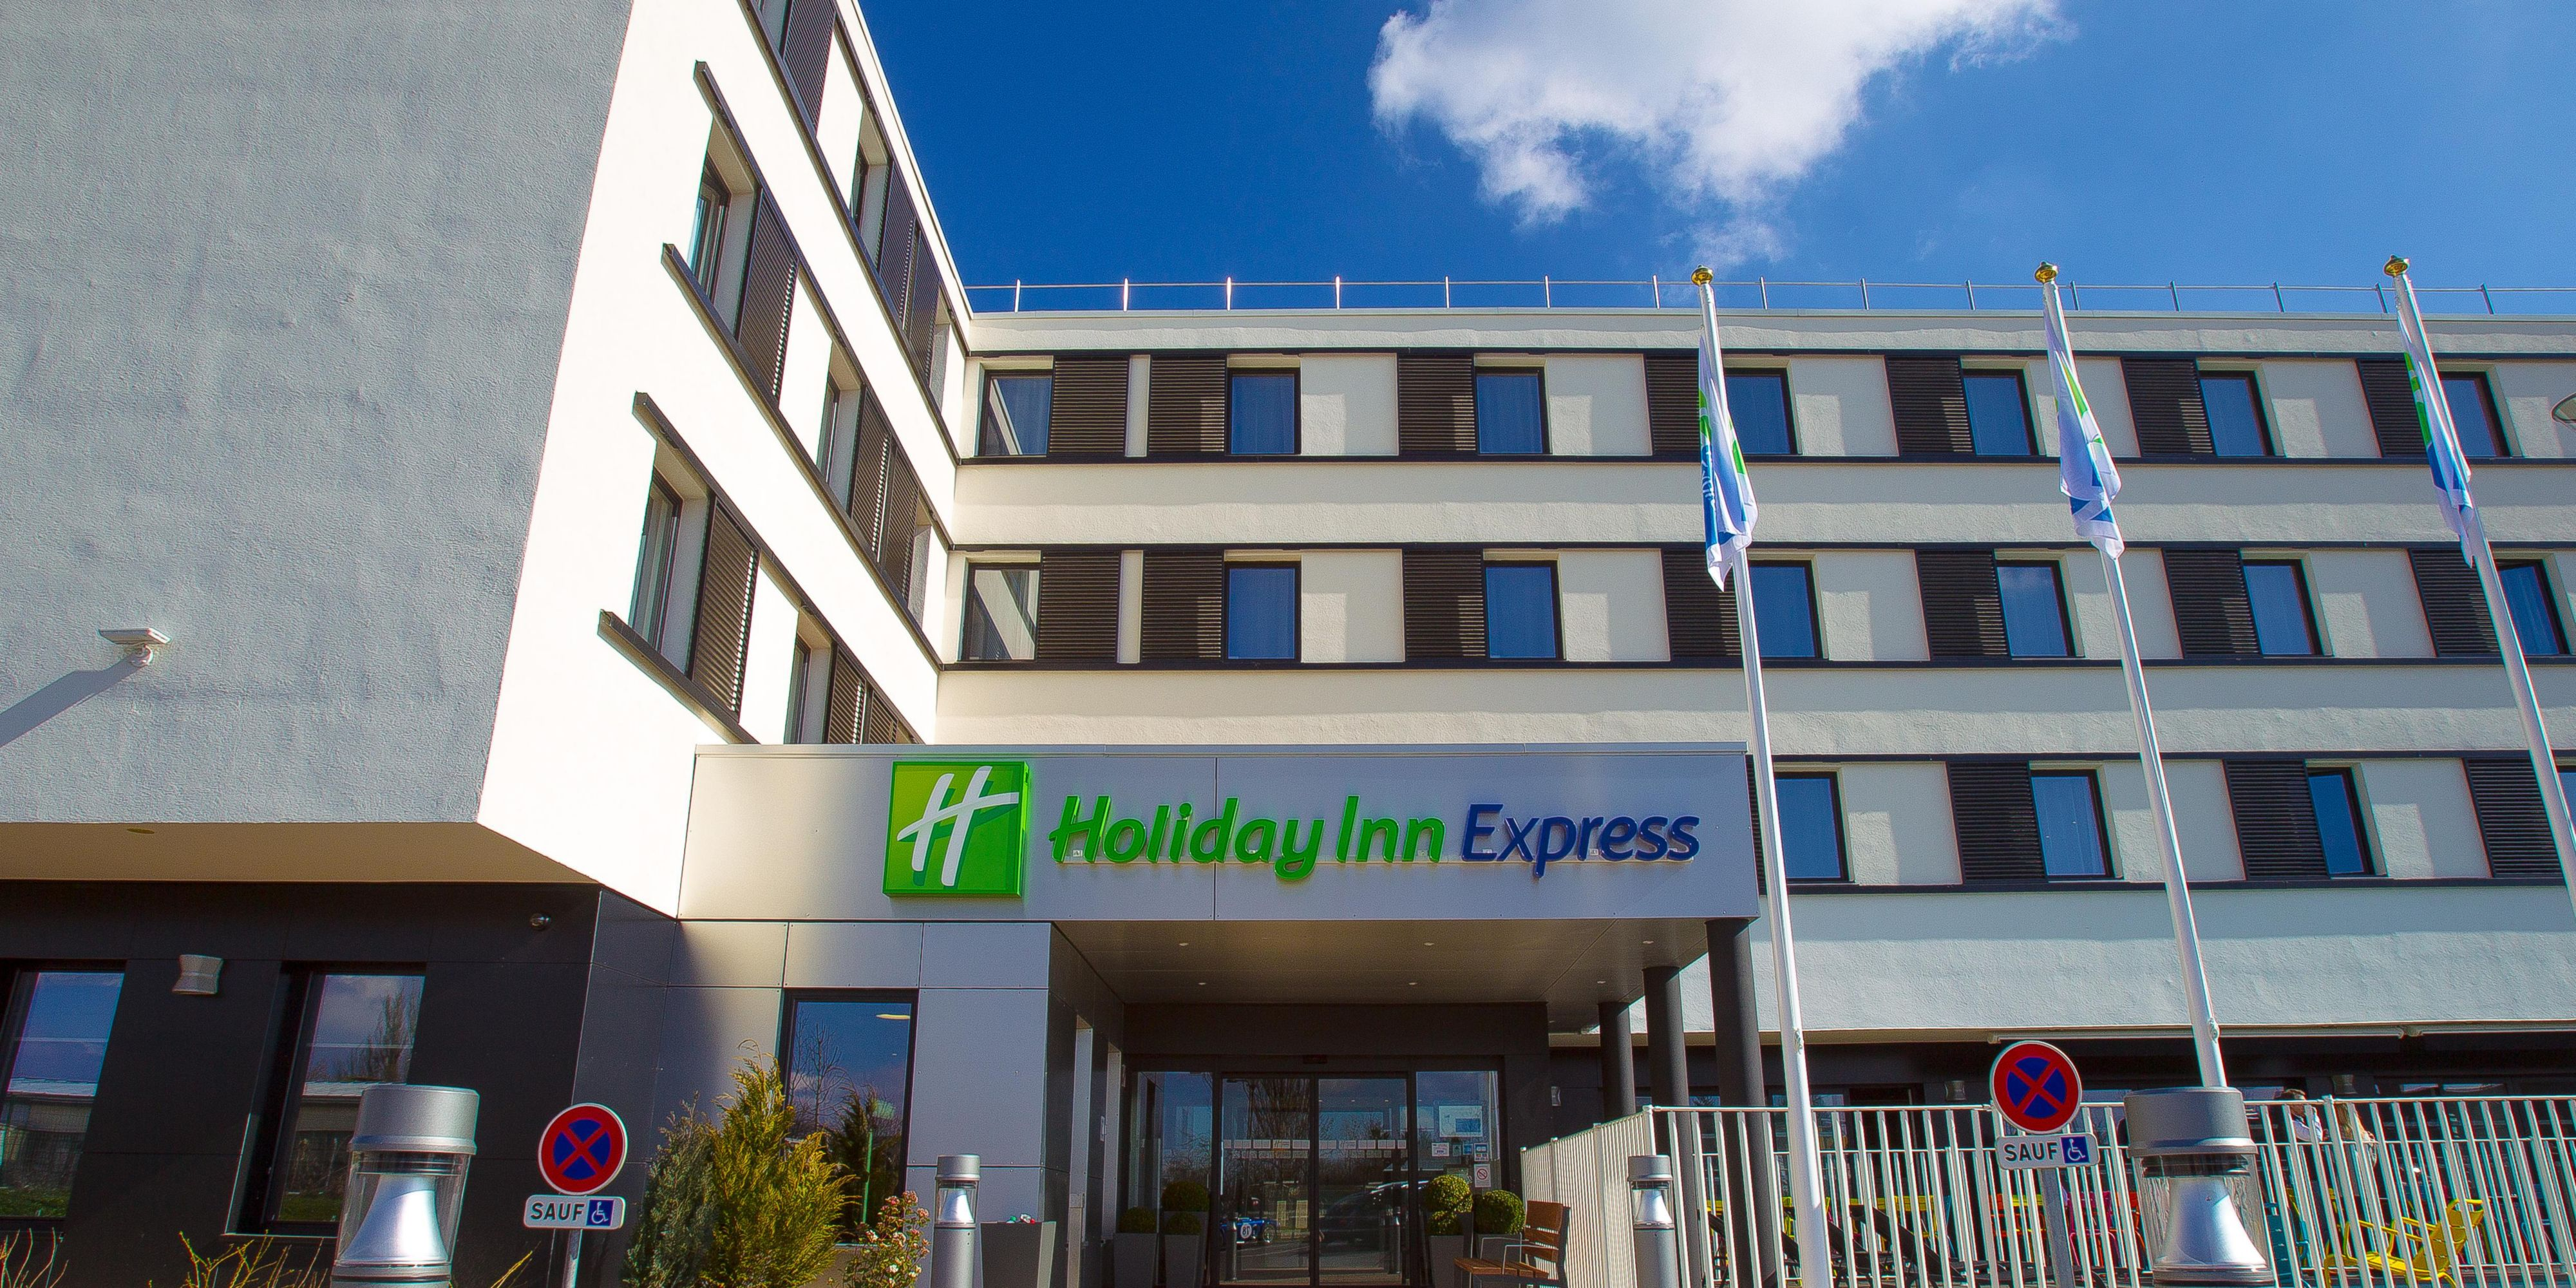 Hhs a to z index: Hotels Near Dijon Holiday Inn Express Dijon France